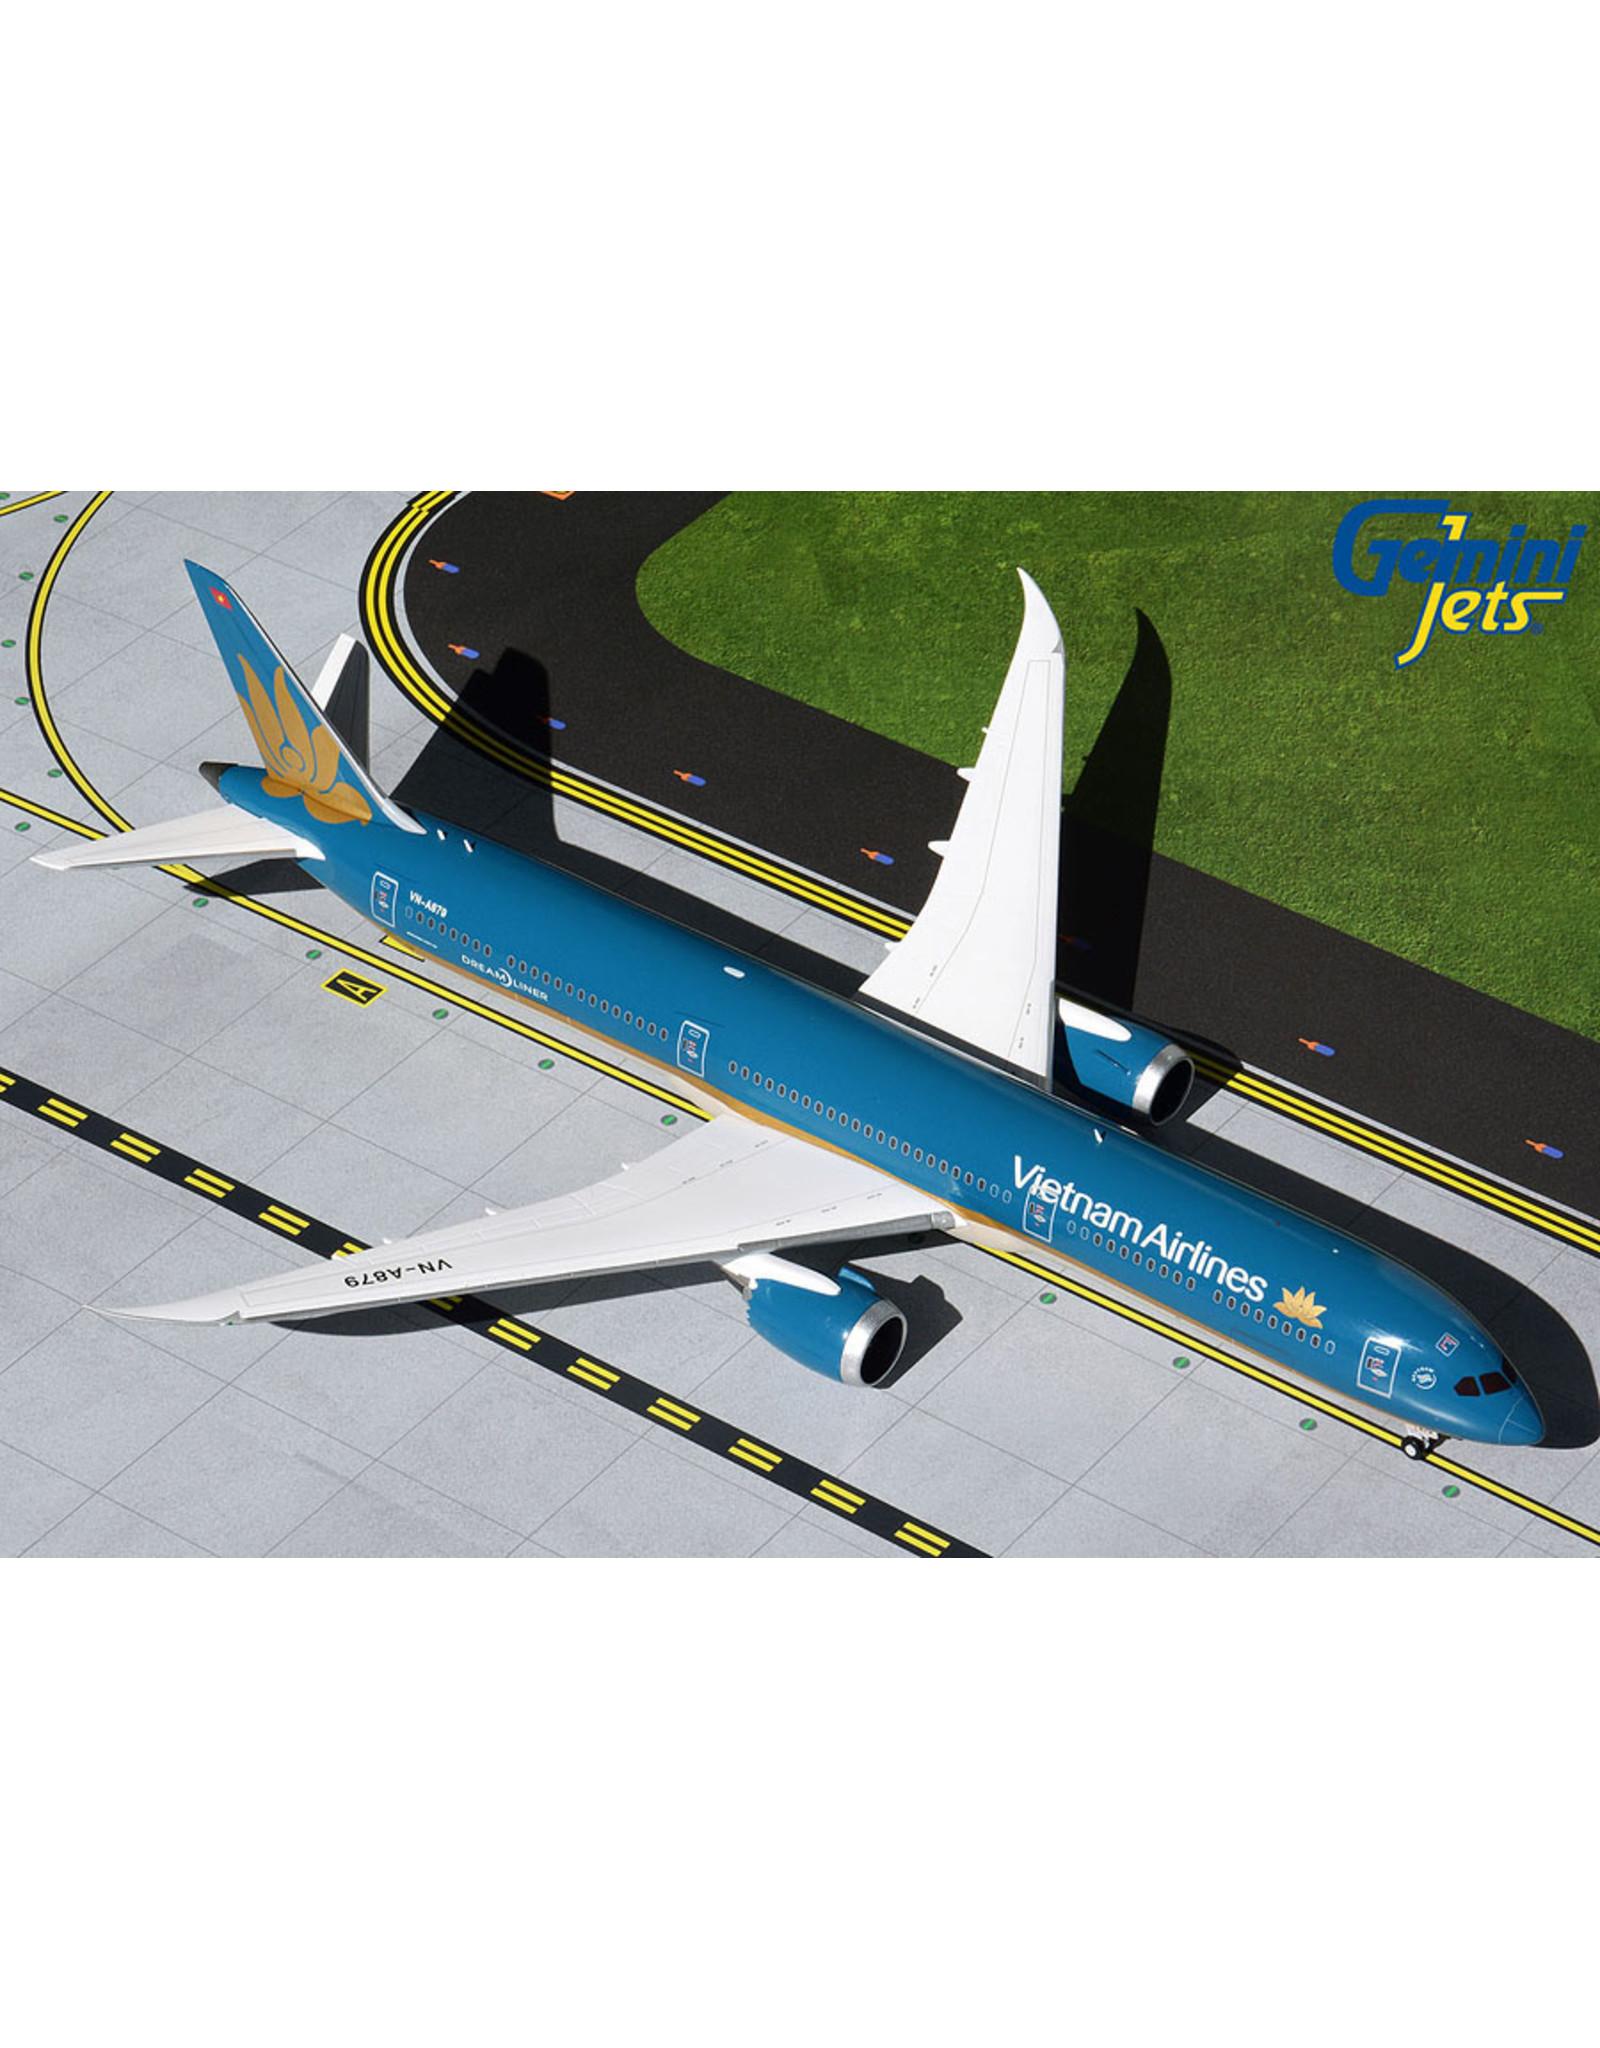 Gemini Gem2 Vietnam 787-10 VN-A879